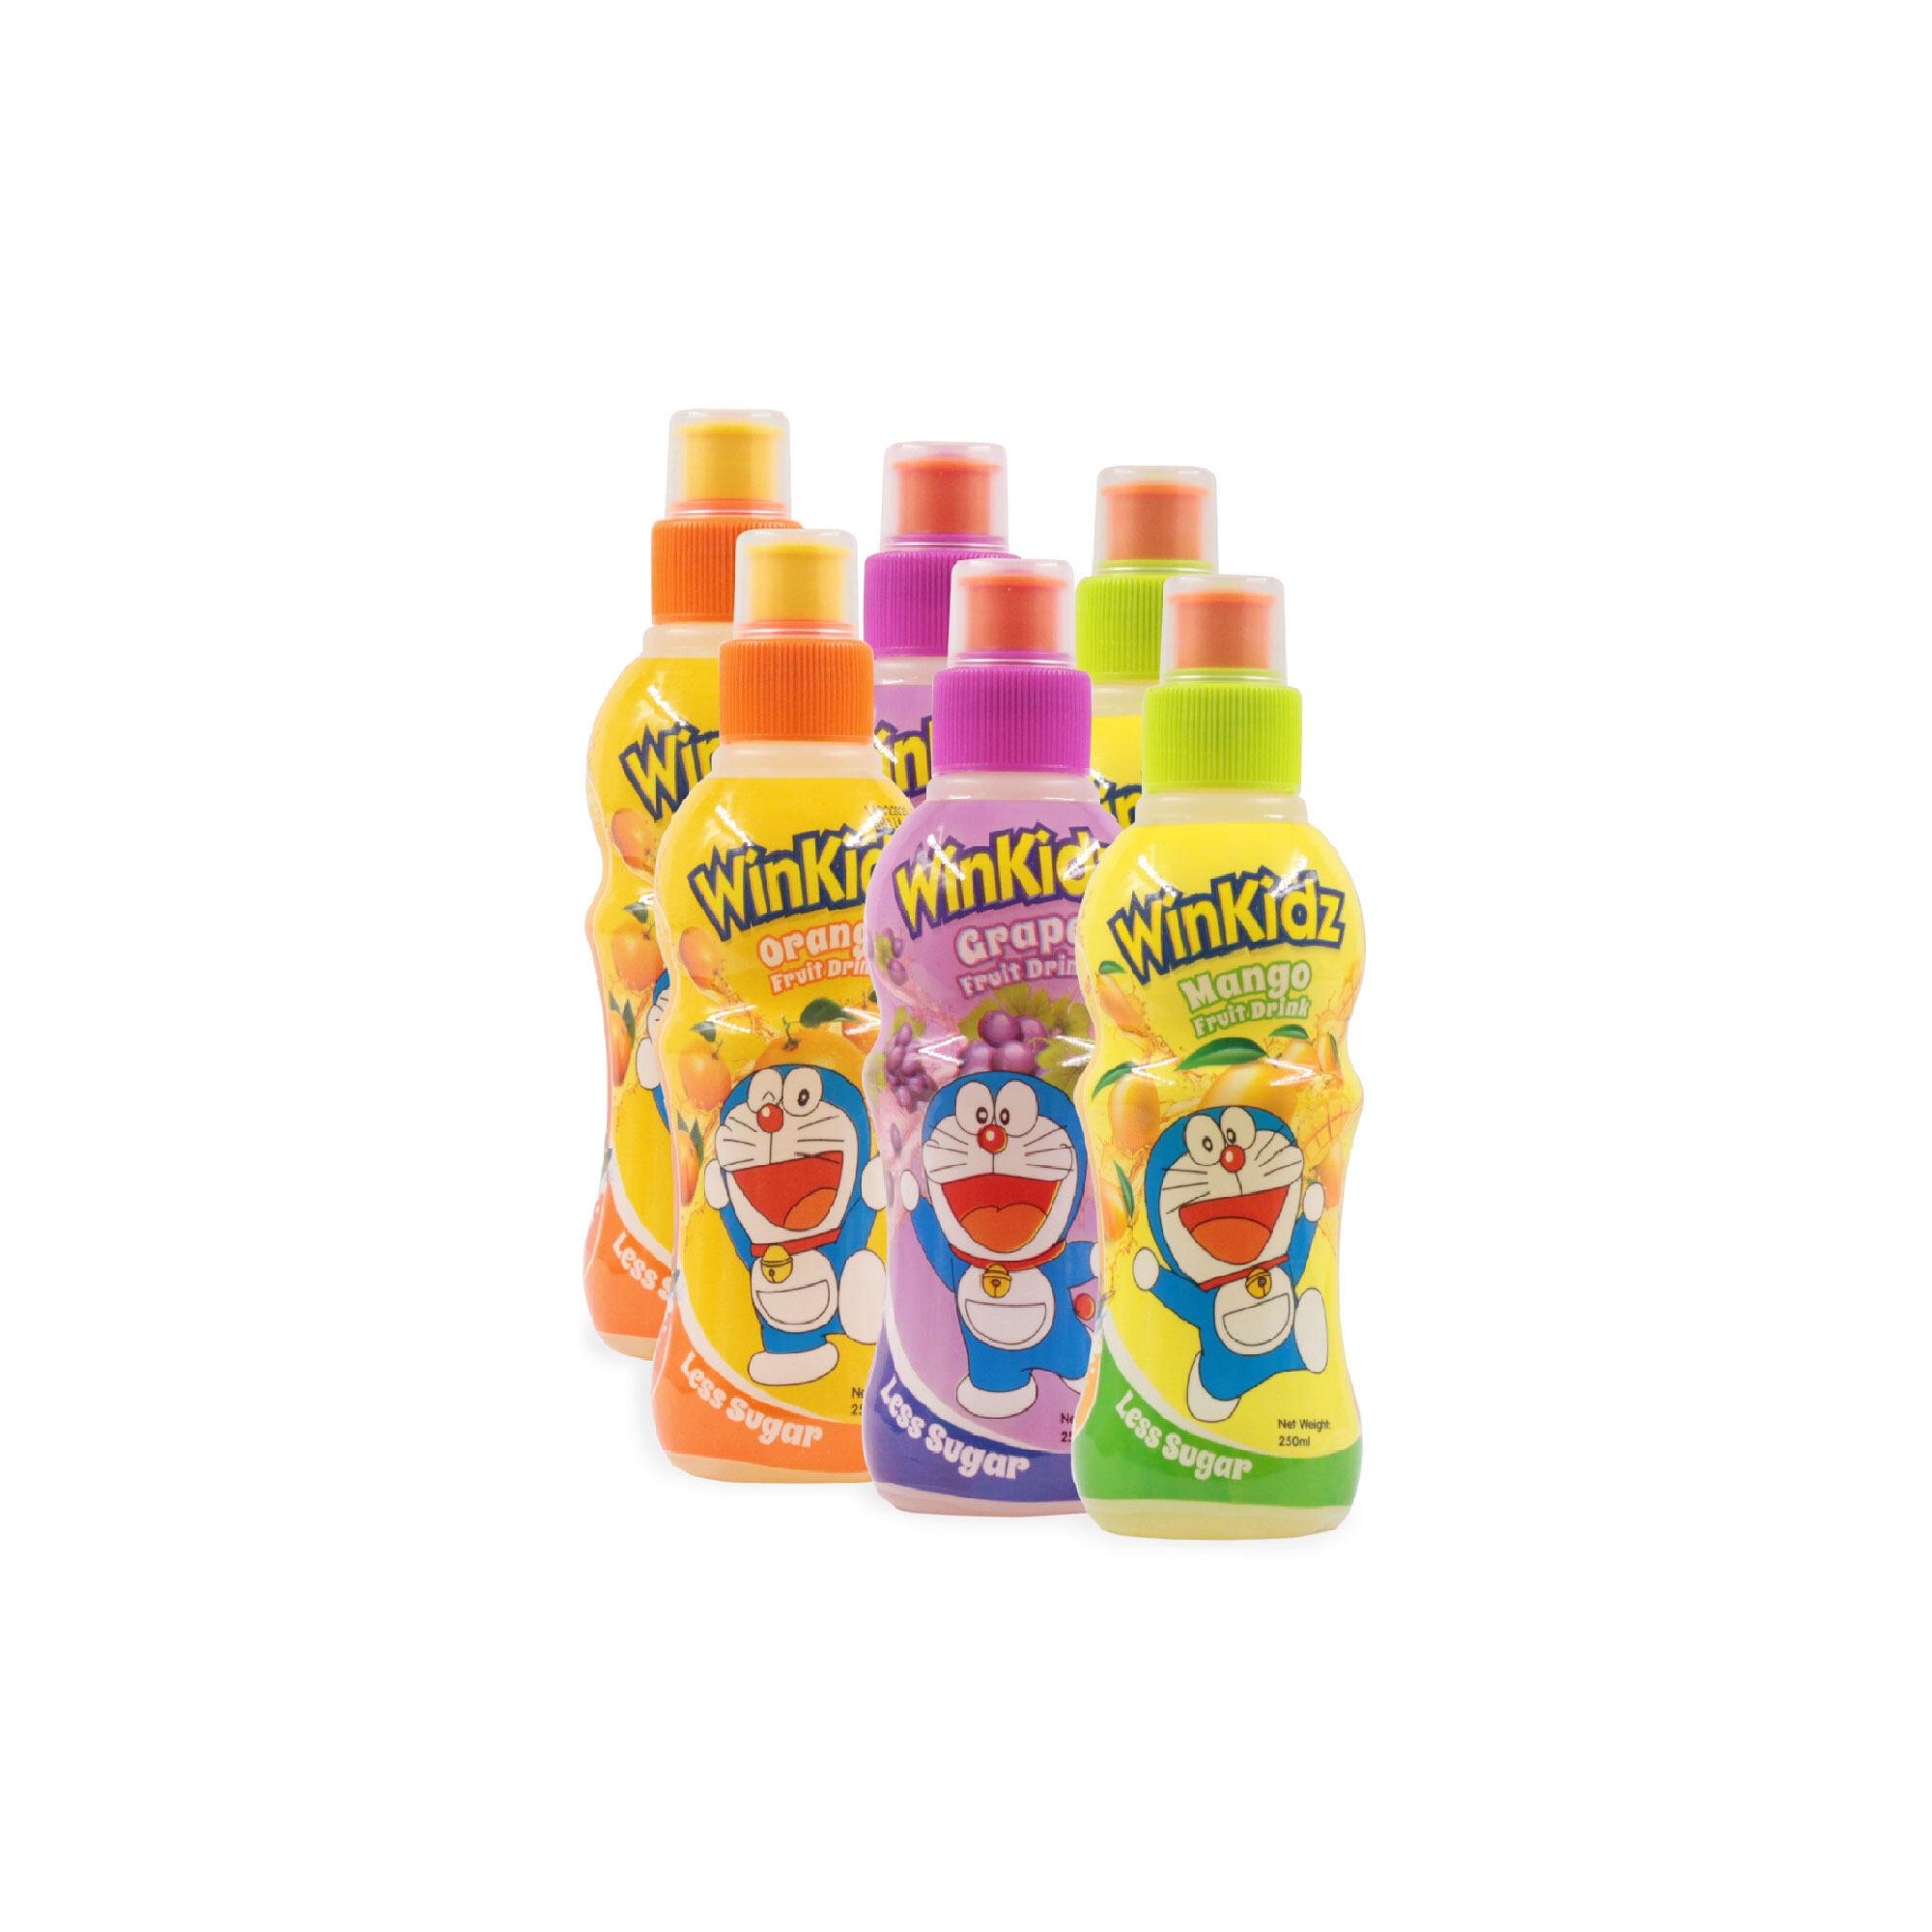 Doraemon Winkidz Fruit Drink 6 In 1 Value Set 250Ml X 6 - Mix Mango, Grape, Orange